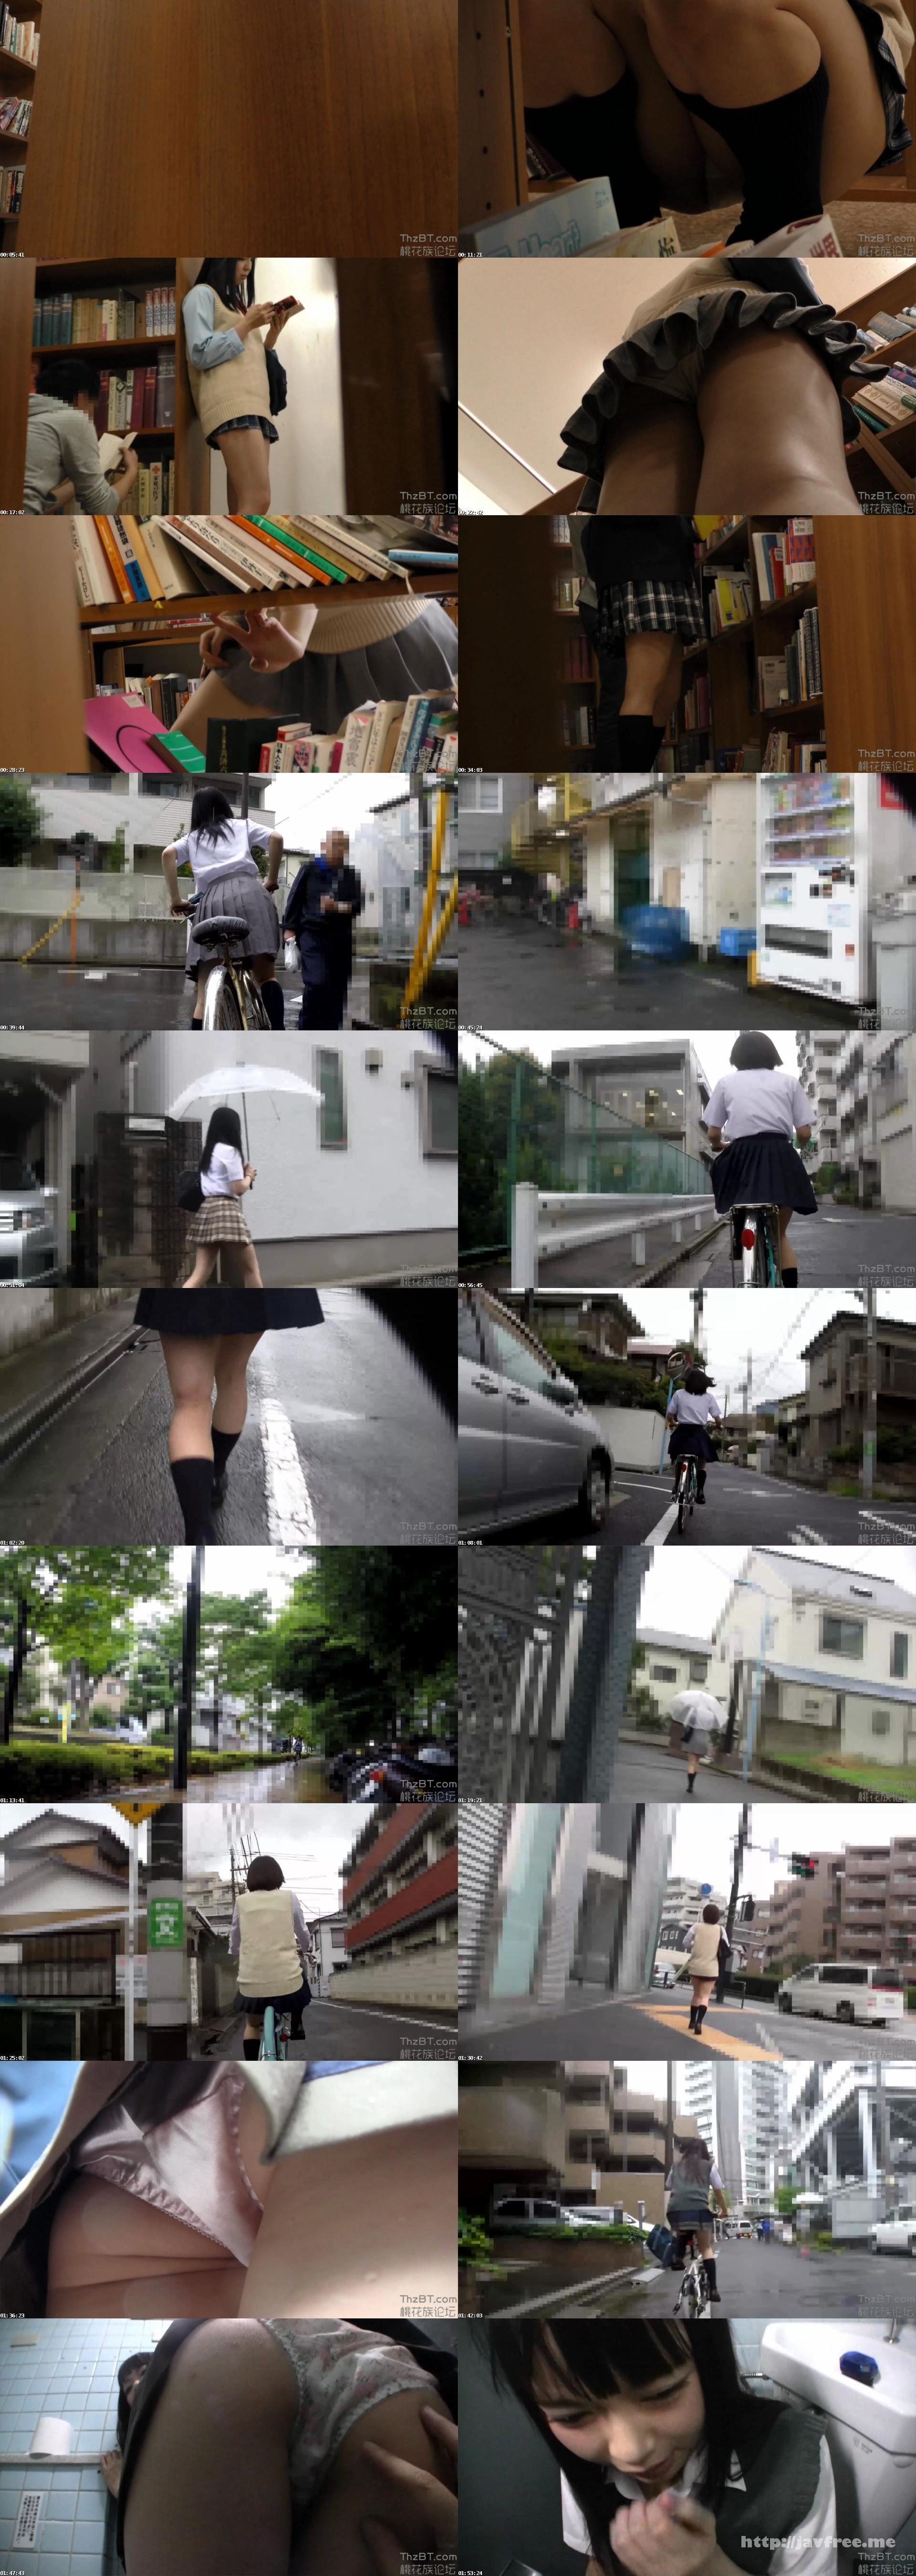 [OMSE-030] 女子校生ストーカー痴漢12人スペシャル - image OMSE-030 on https://javfree.me